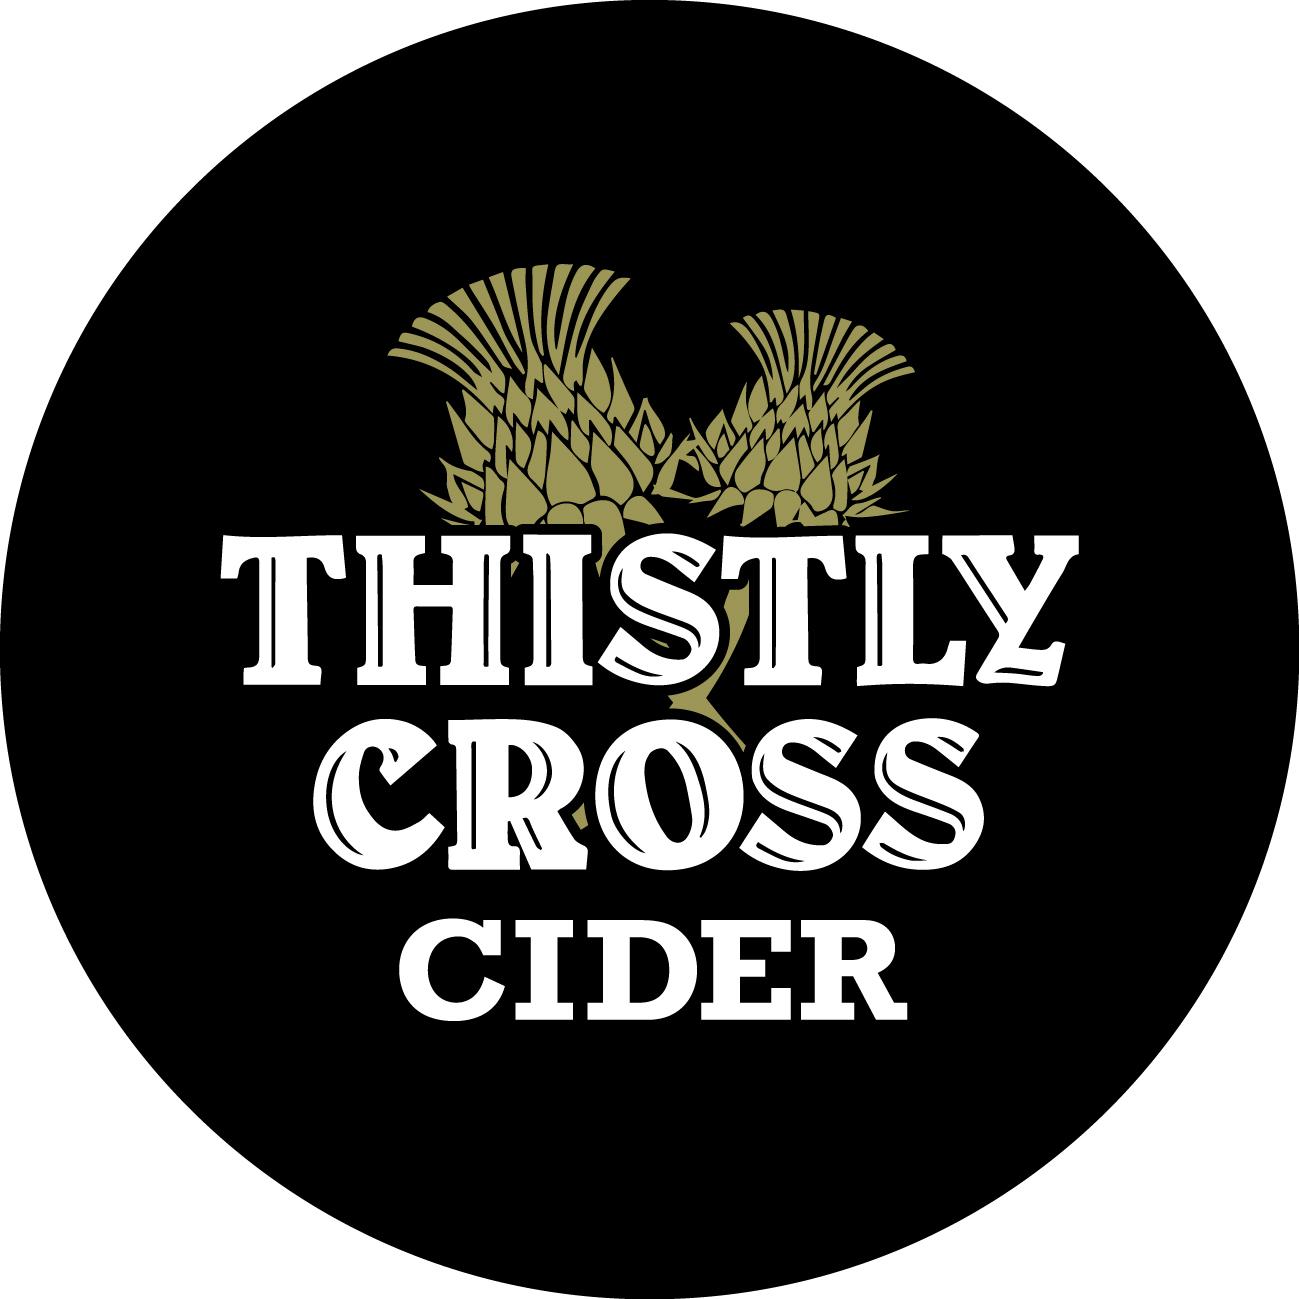 Thistly-Cross-reveresed-circle.jpg